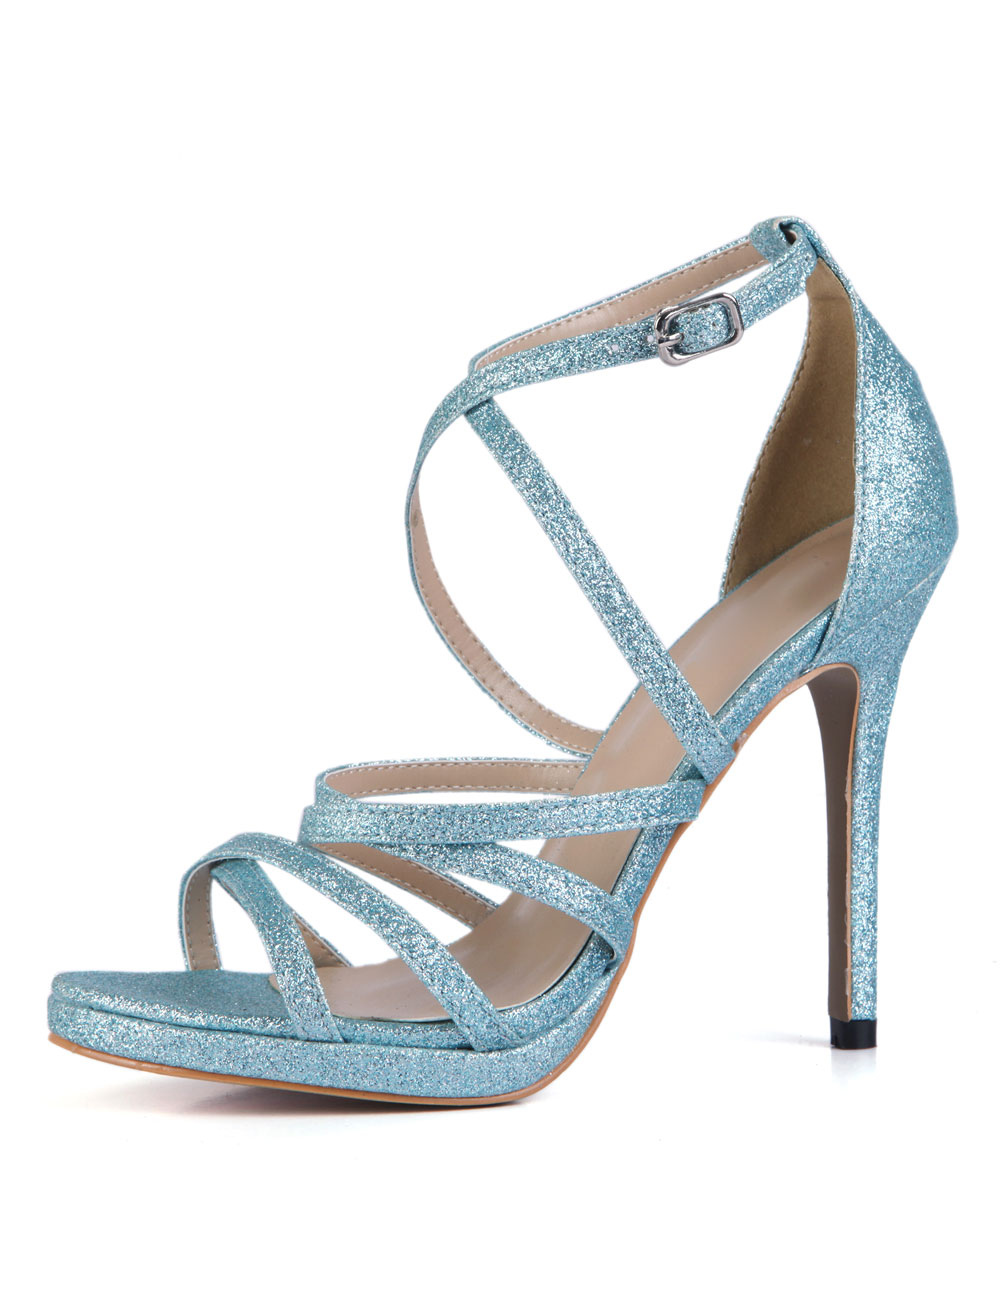 Pastel Blue Glitter Dress Sandals